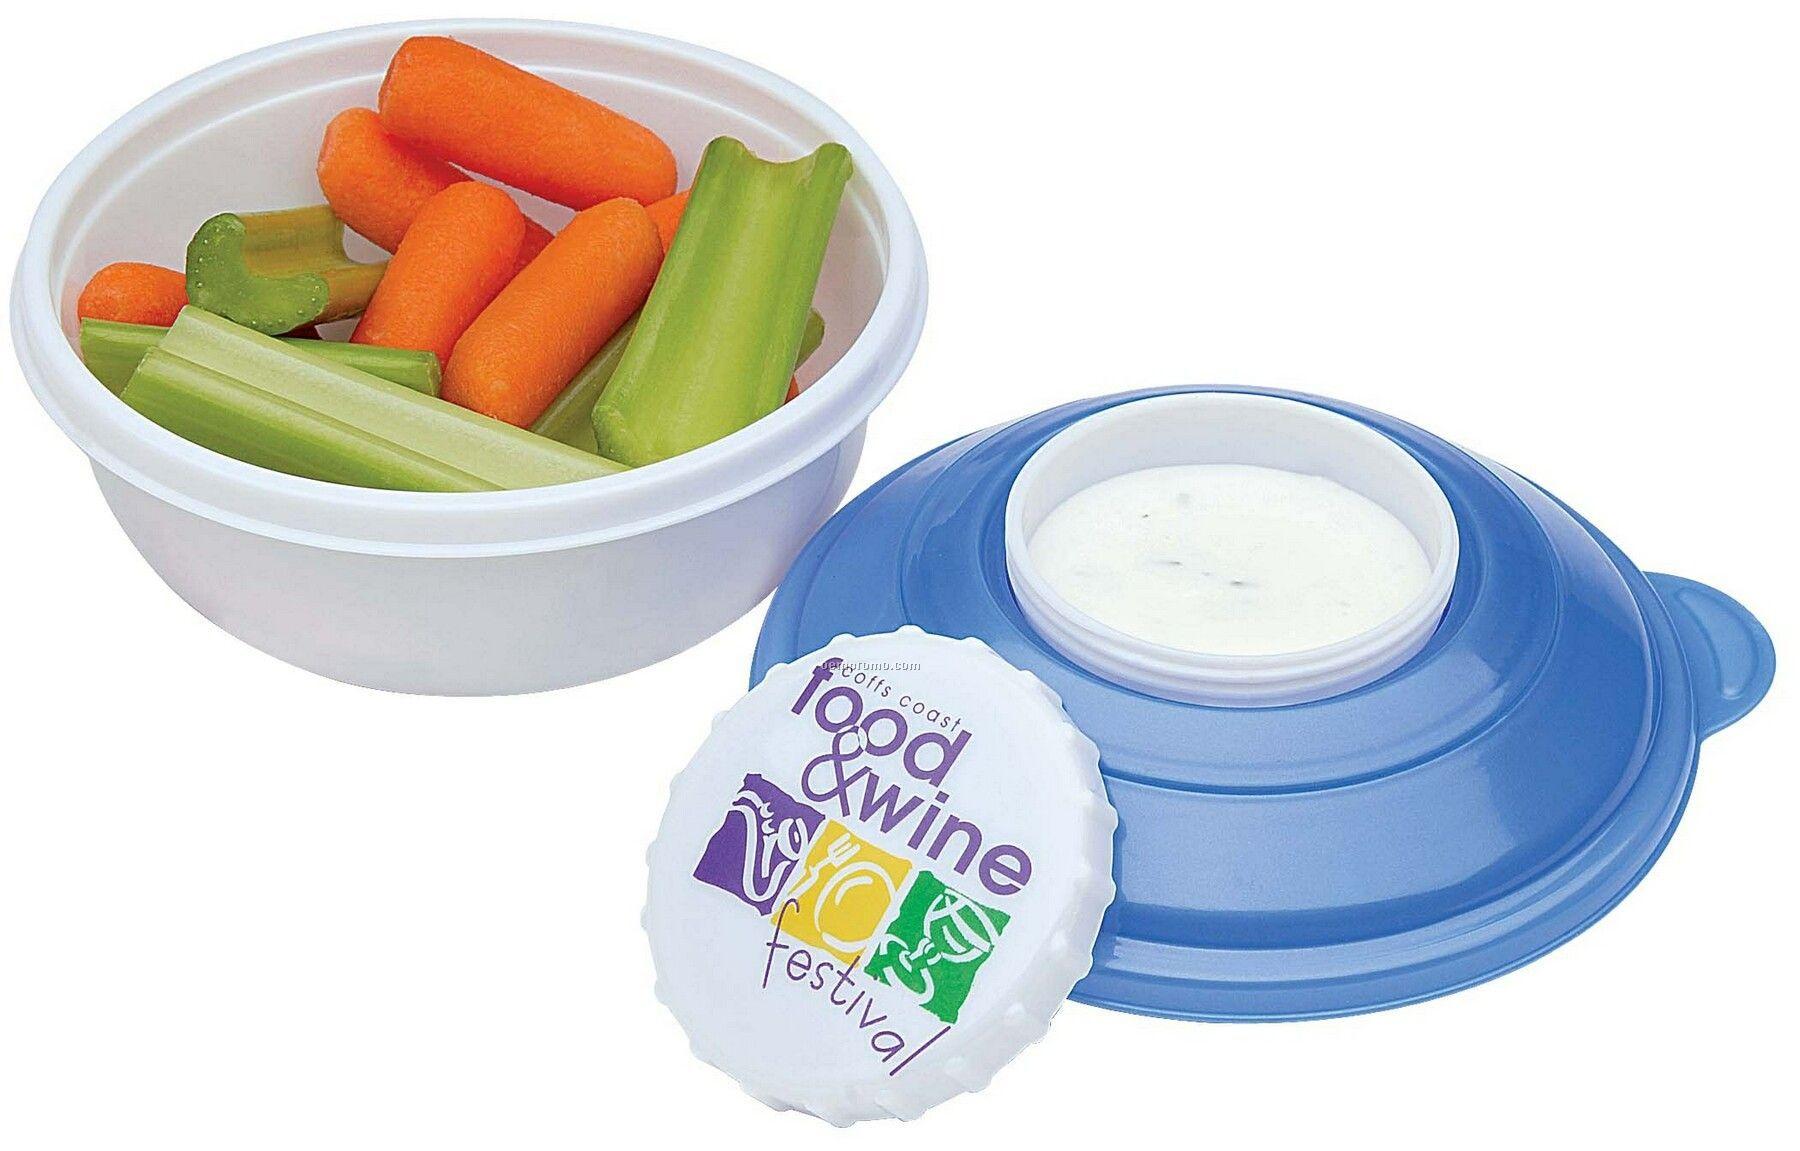 19 Oz. Rcc Koozie Snack & Dip Container